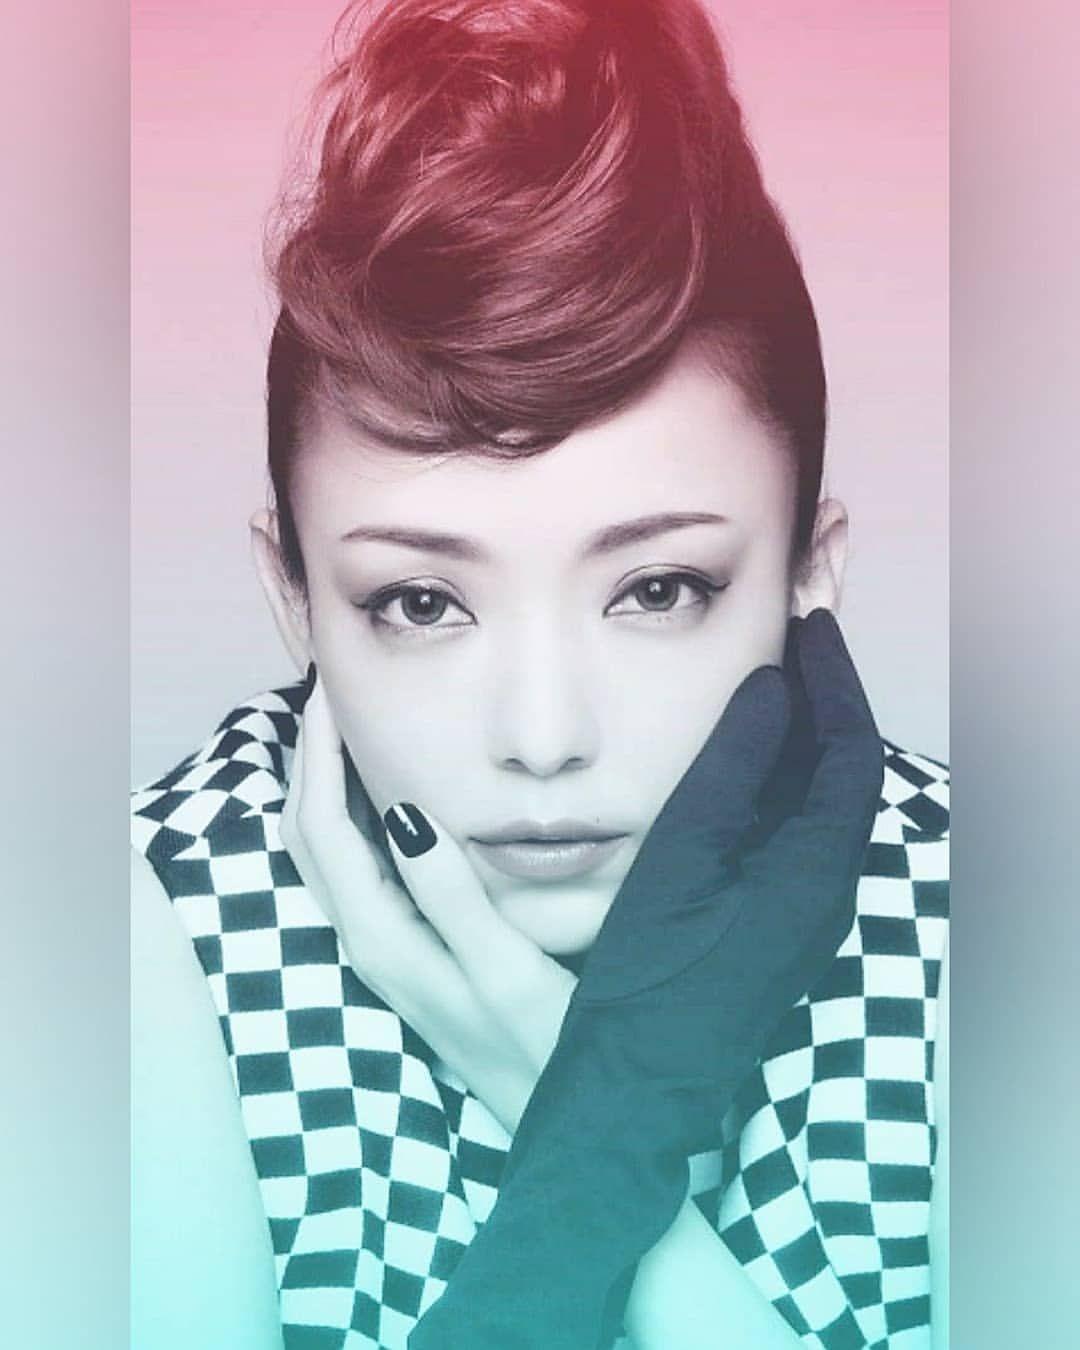 bafafa8c96c76 namie738 only - Instagram 「♡ 加工してみましたver. .  安室奈美恵 ...